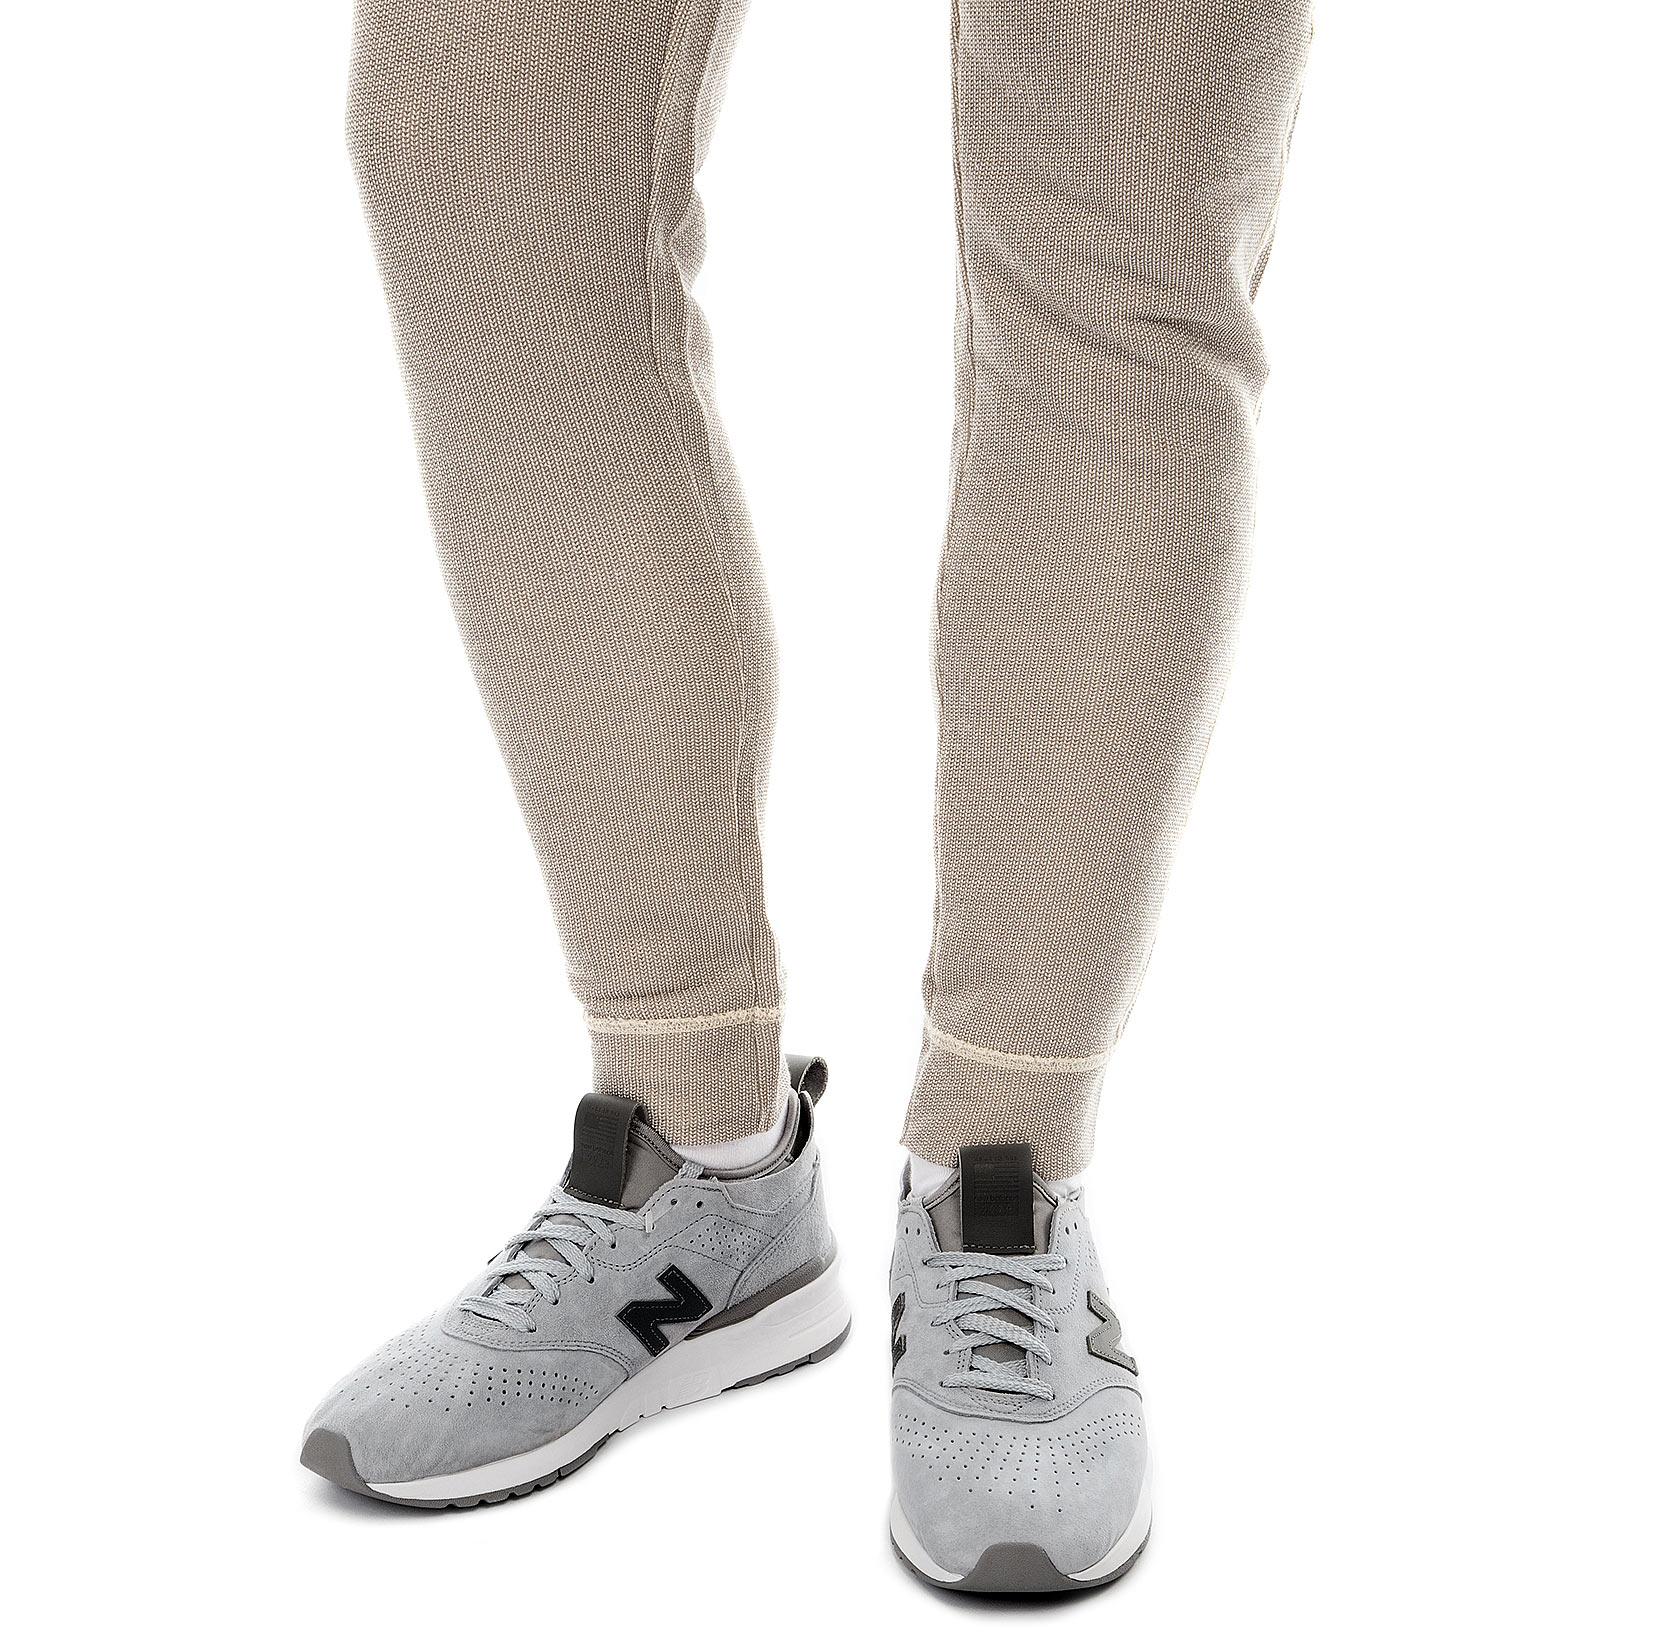 Чоловіче взуття повсякденне New Balance 997 Deconstructed M997DGR2 | New Balance